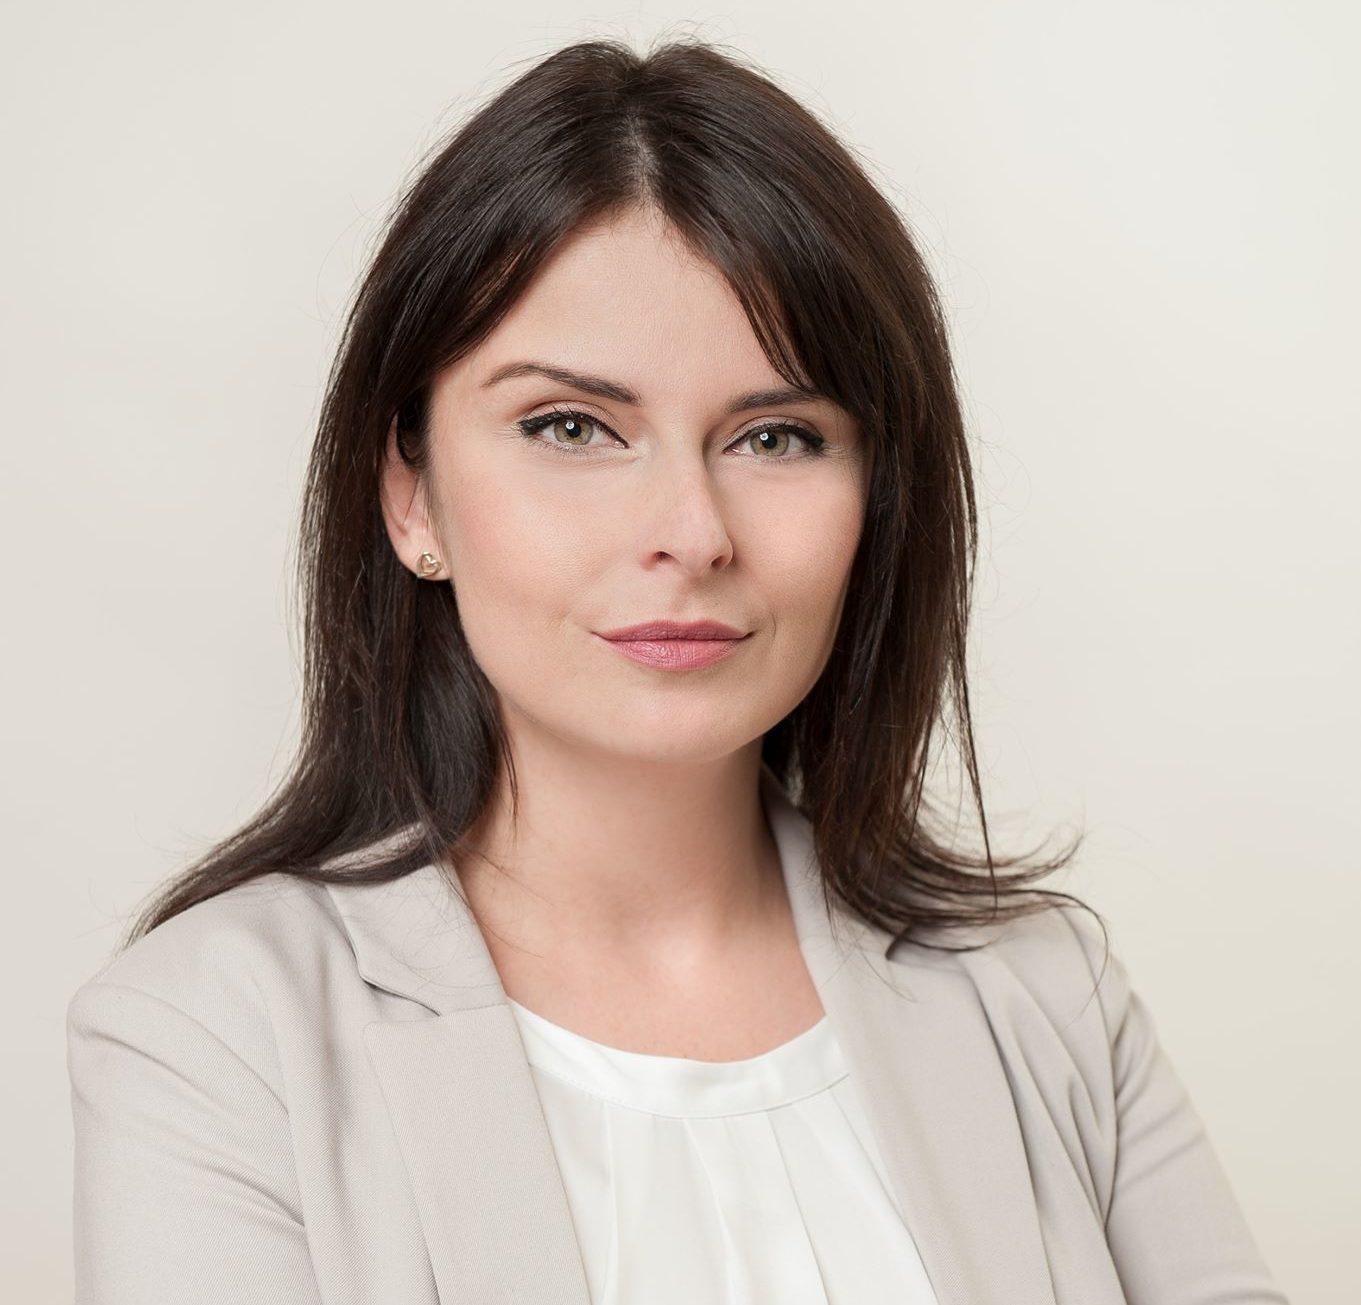 Agnieszka Kulikowska-Wielgus